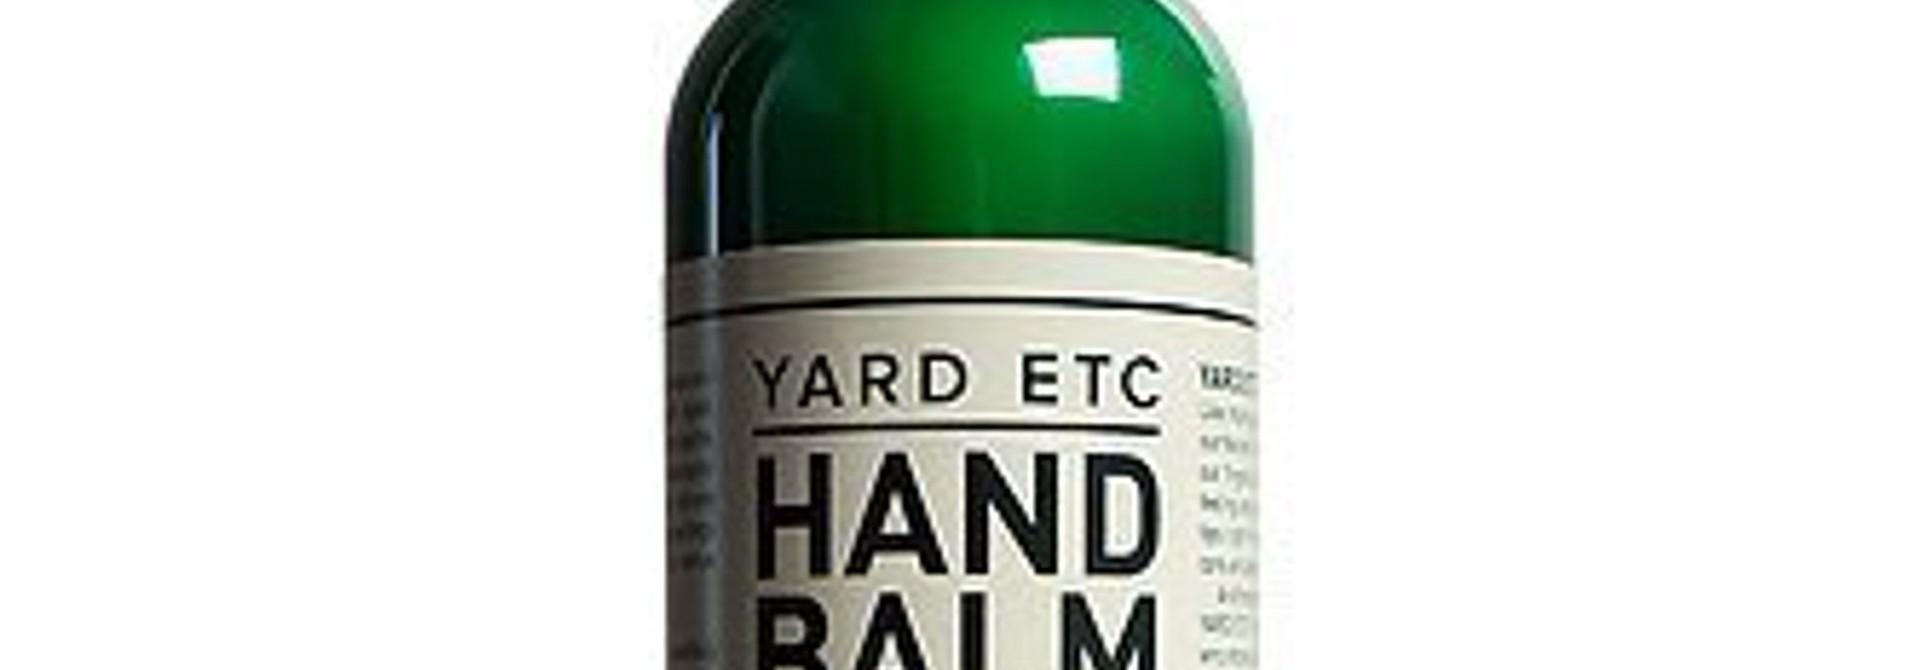 Hand Balm - Green Tomato